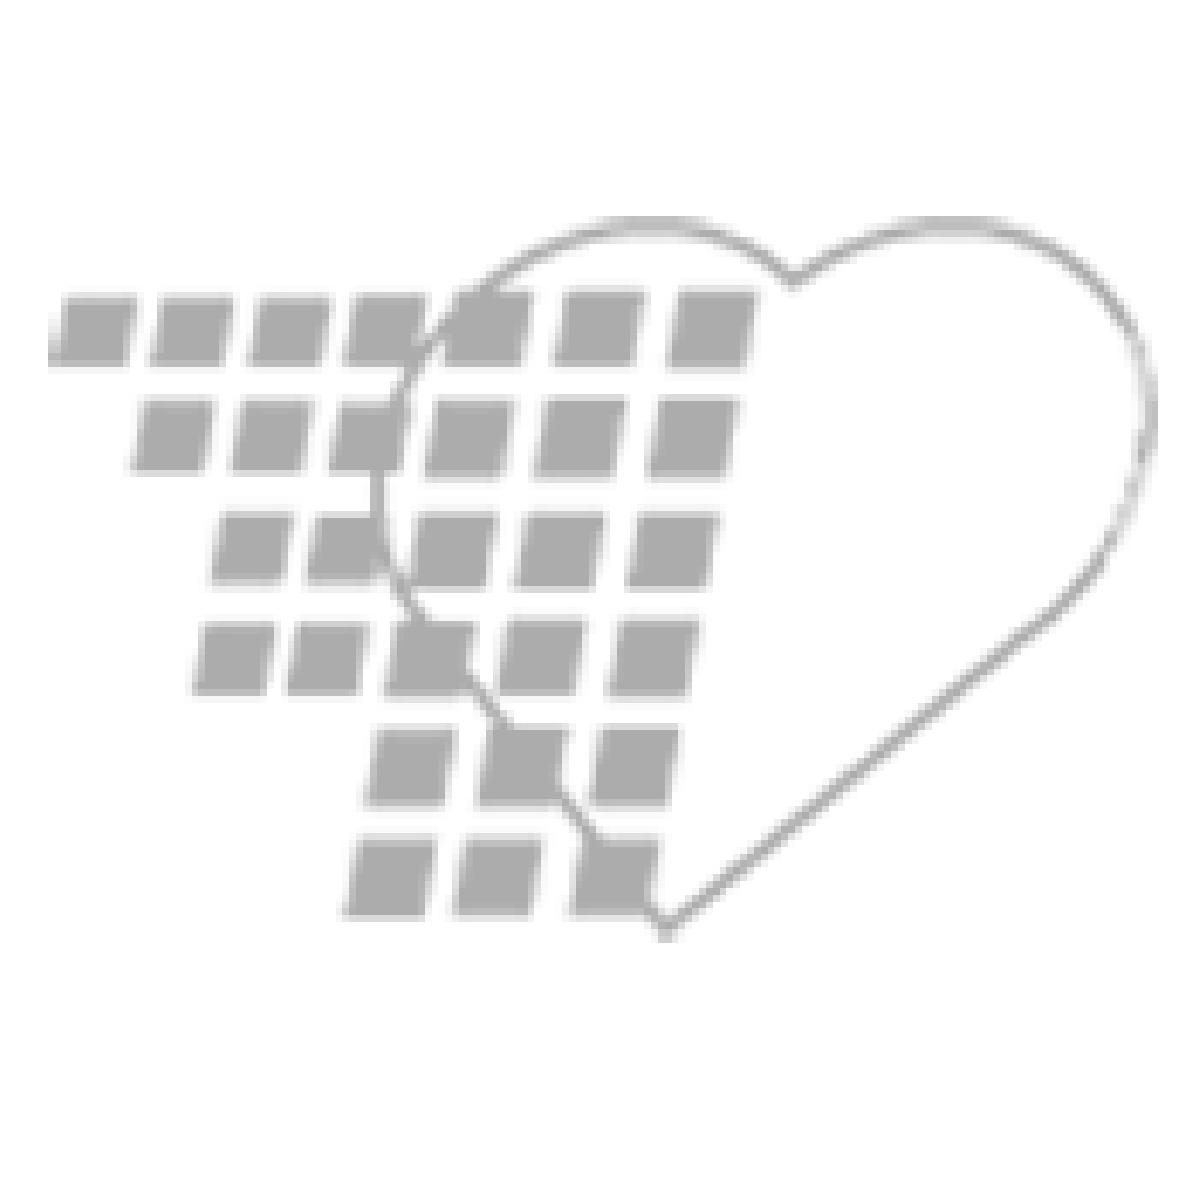 05-87-3085 Dover™ Foley Catheter 8 Fr - 2-Way Pediatric